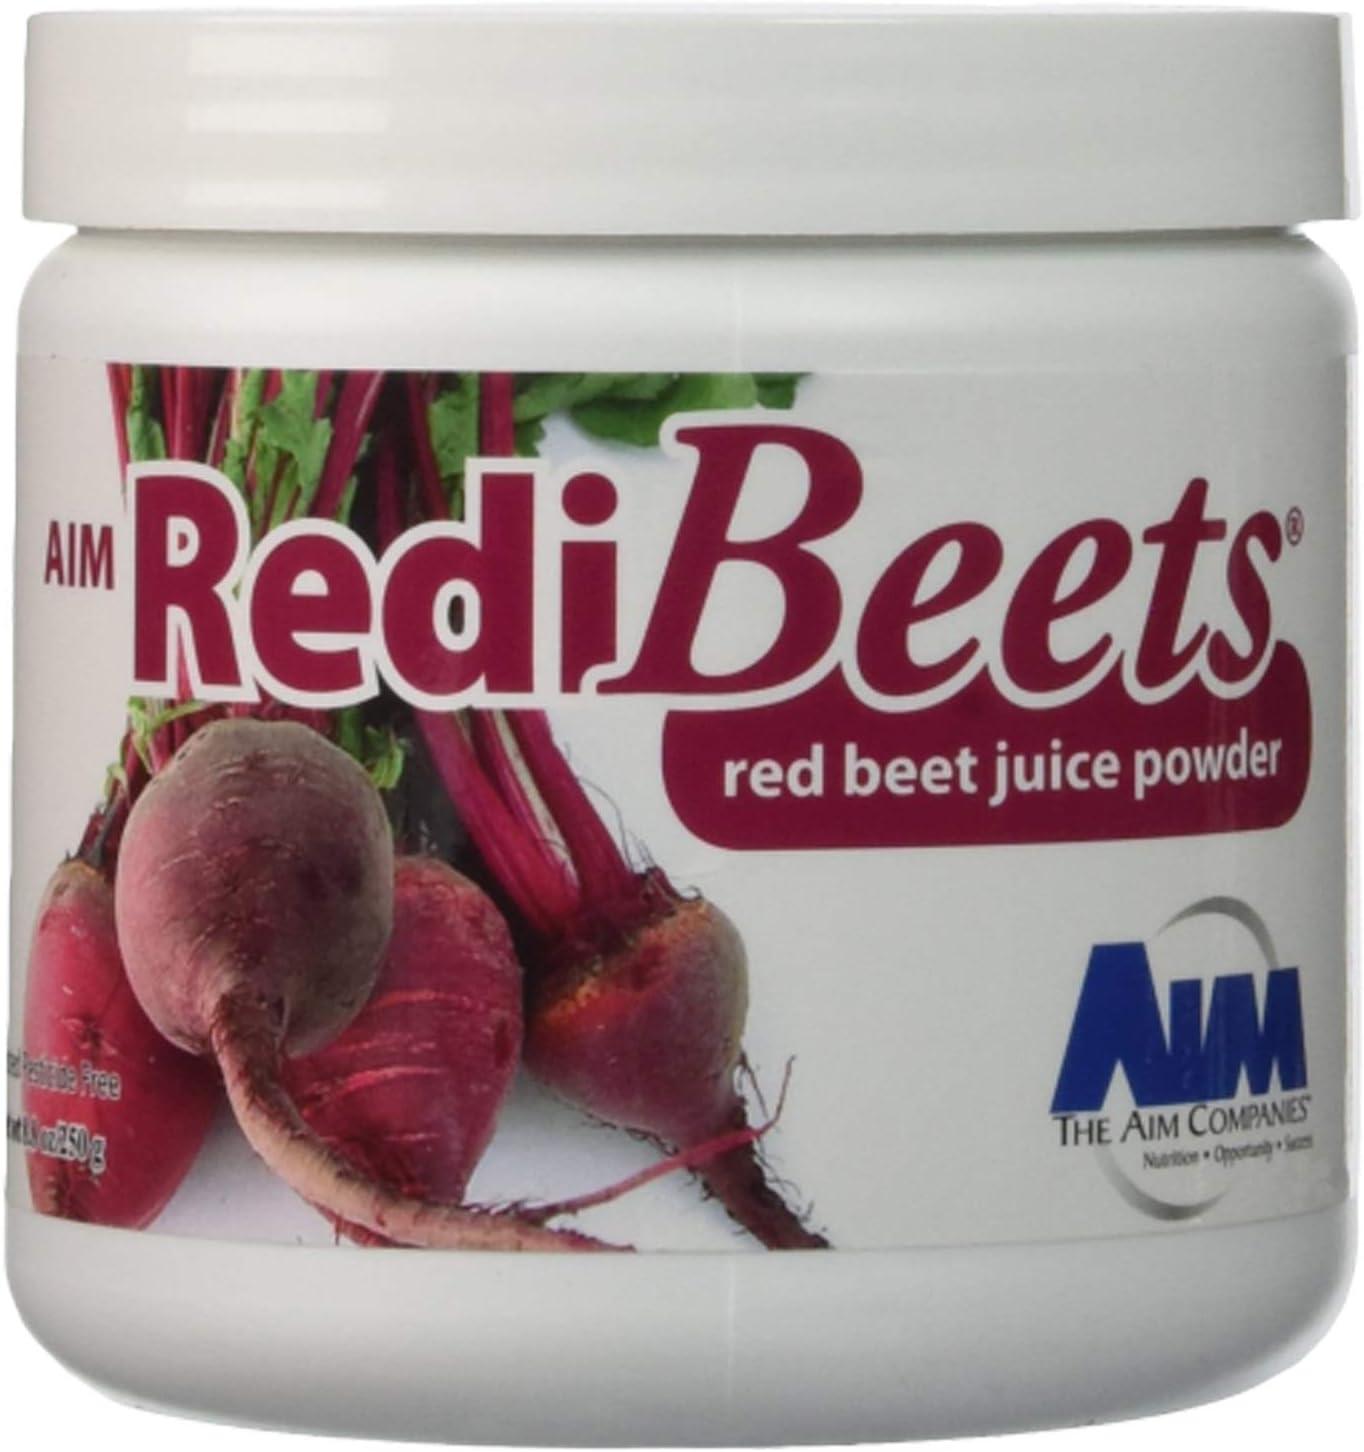 AIM Redi Beets shop for Beet Supplementation 100% quality warranty! Juice oz 8.8